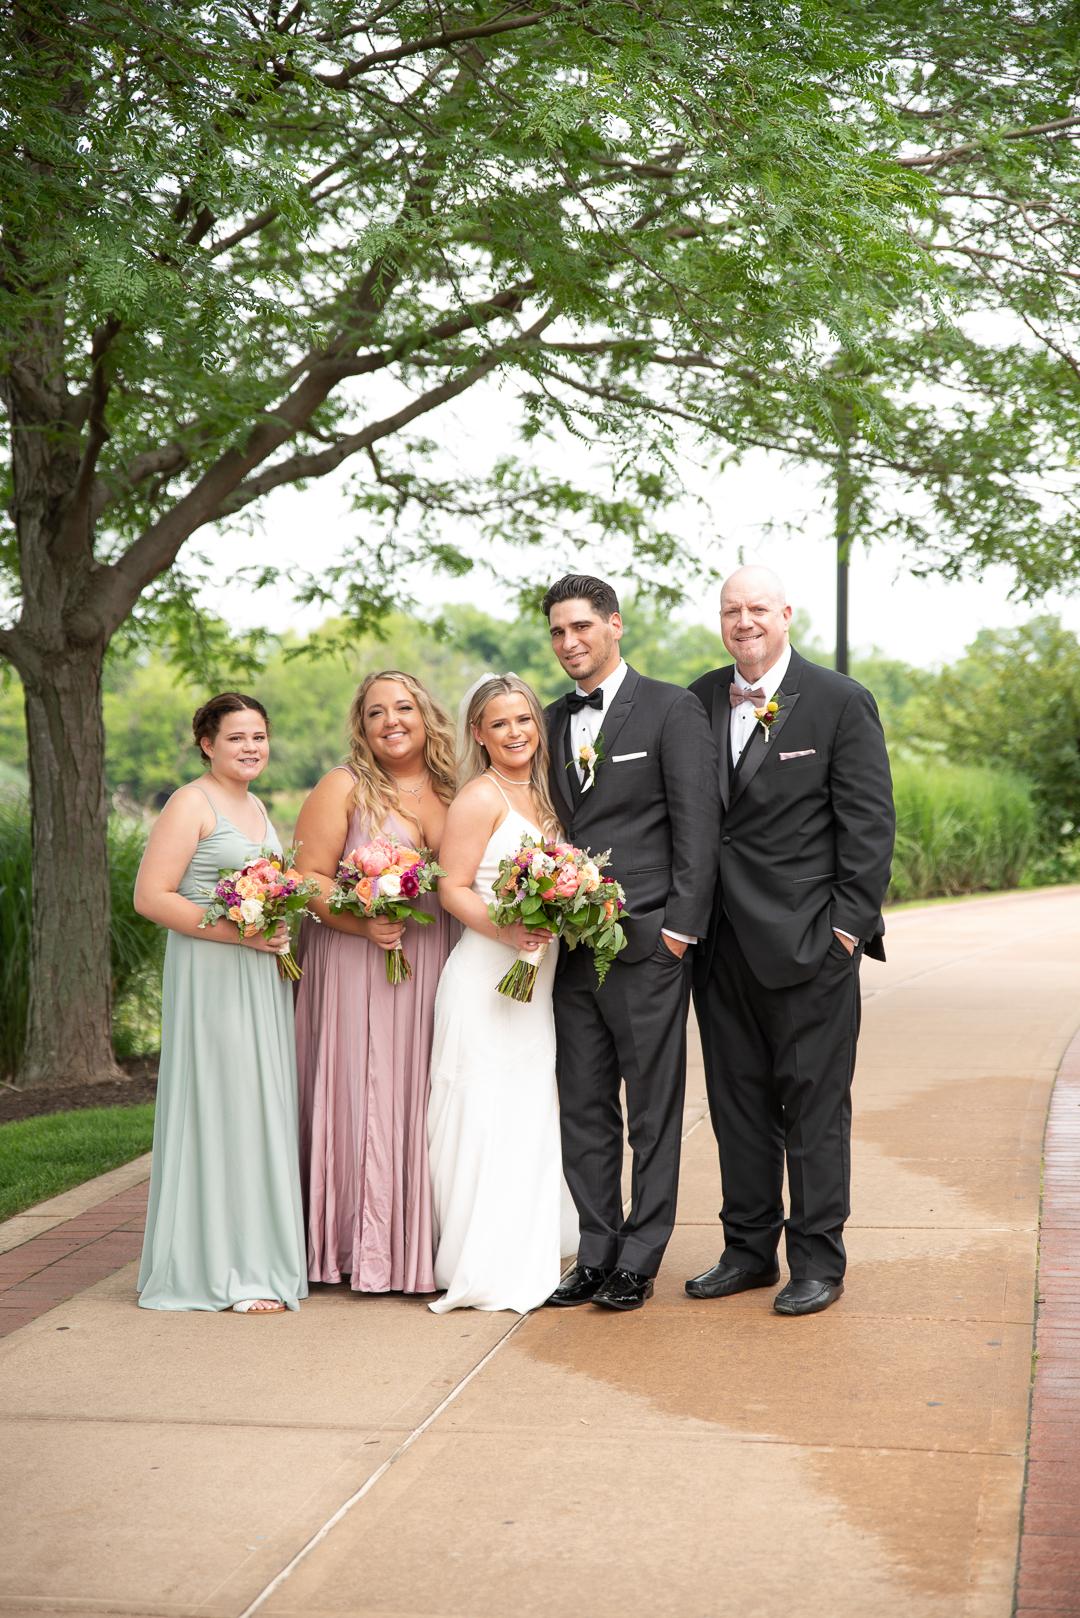 Riverfront Events bridal party